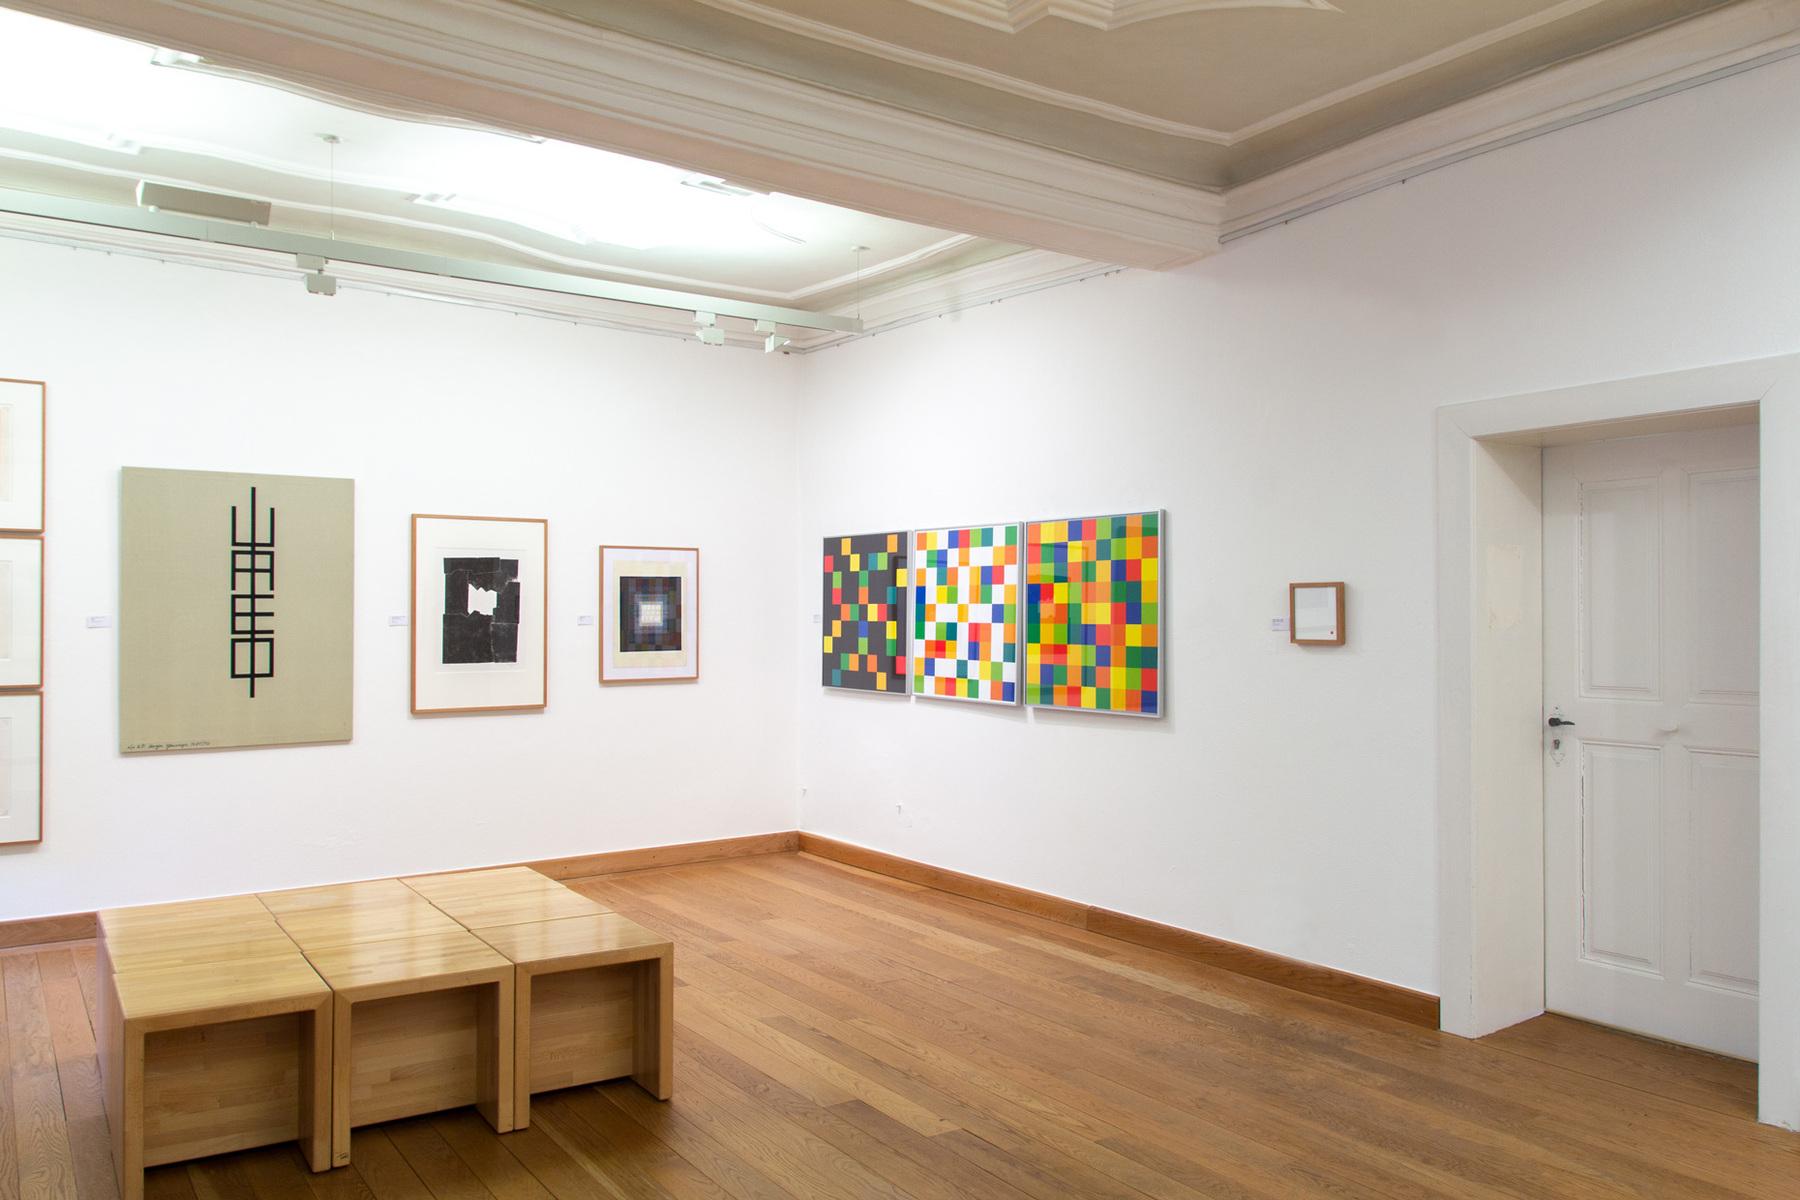 Philipp Valenta - Abstraktion/KonkretionKonzeption - Platons Erben, Kunstmuseum Bayreuth